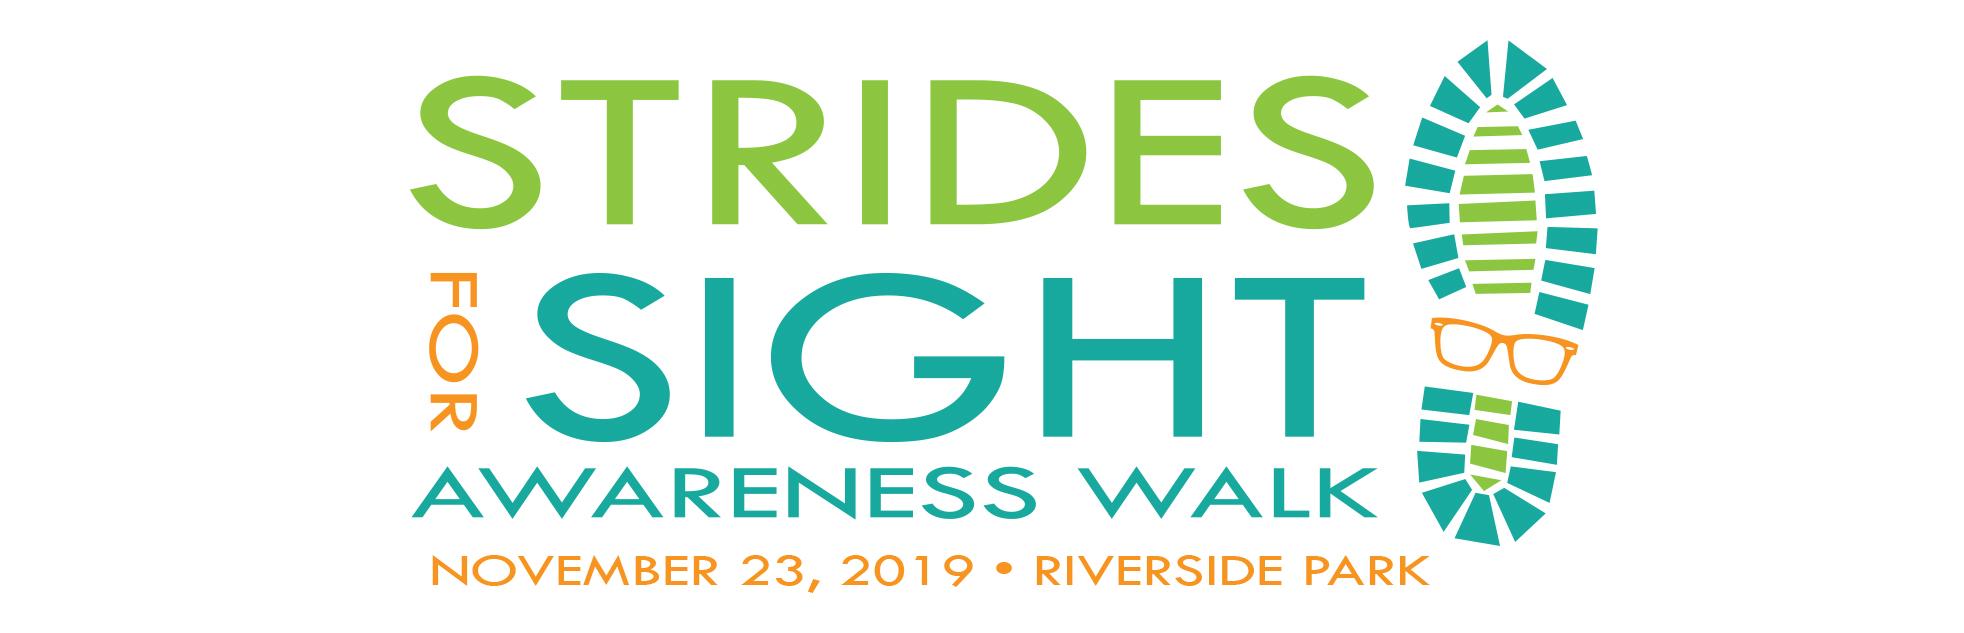 strides for sight awareness walk